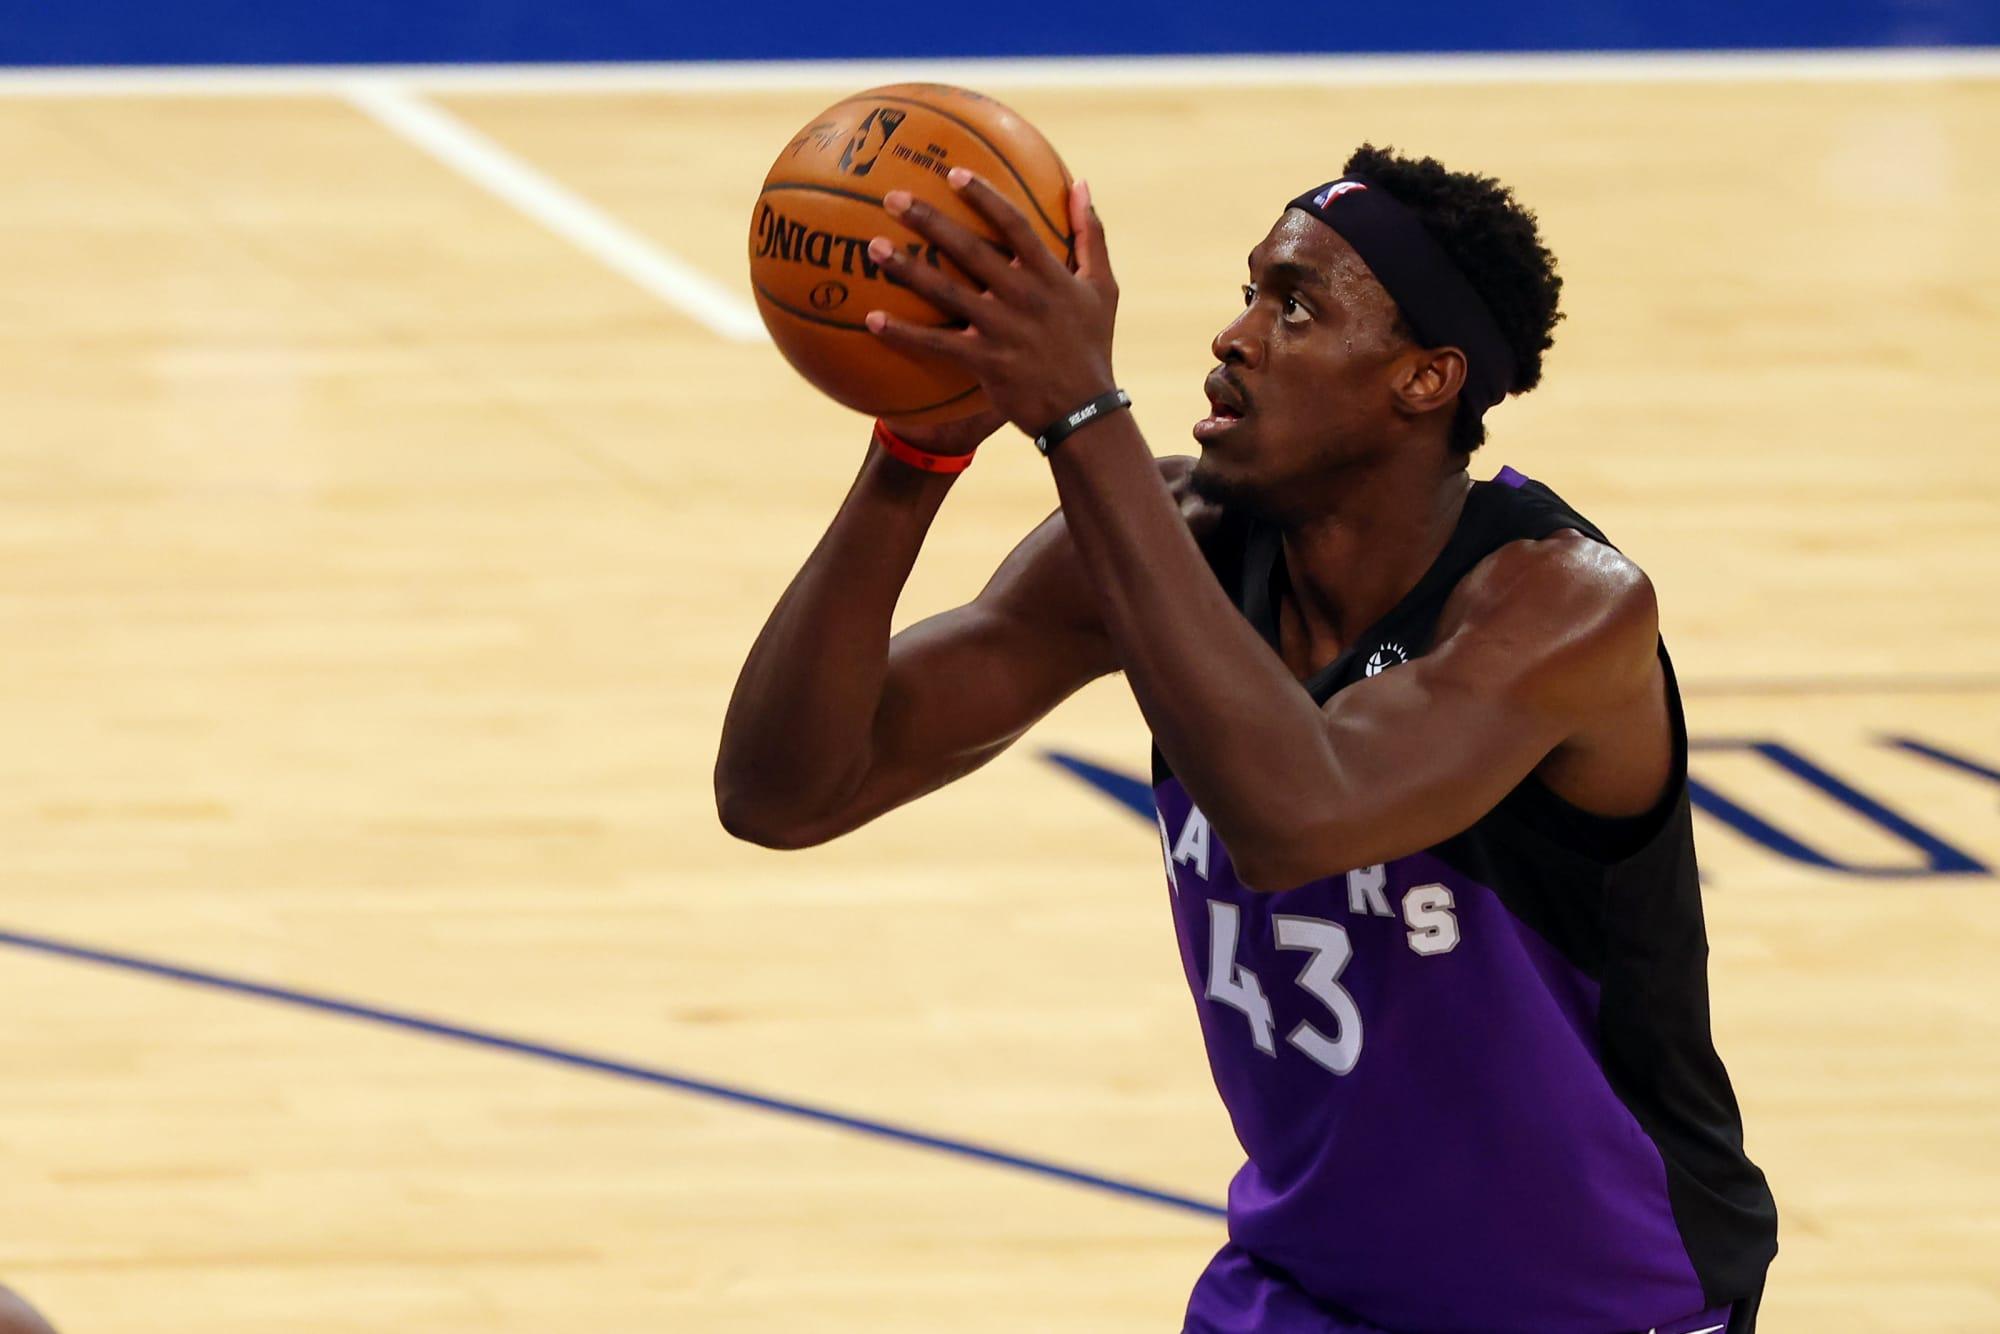 Toronto Raptors: Playing Daryl Morey's style of basketball hasn't been working